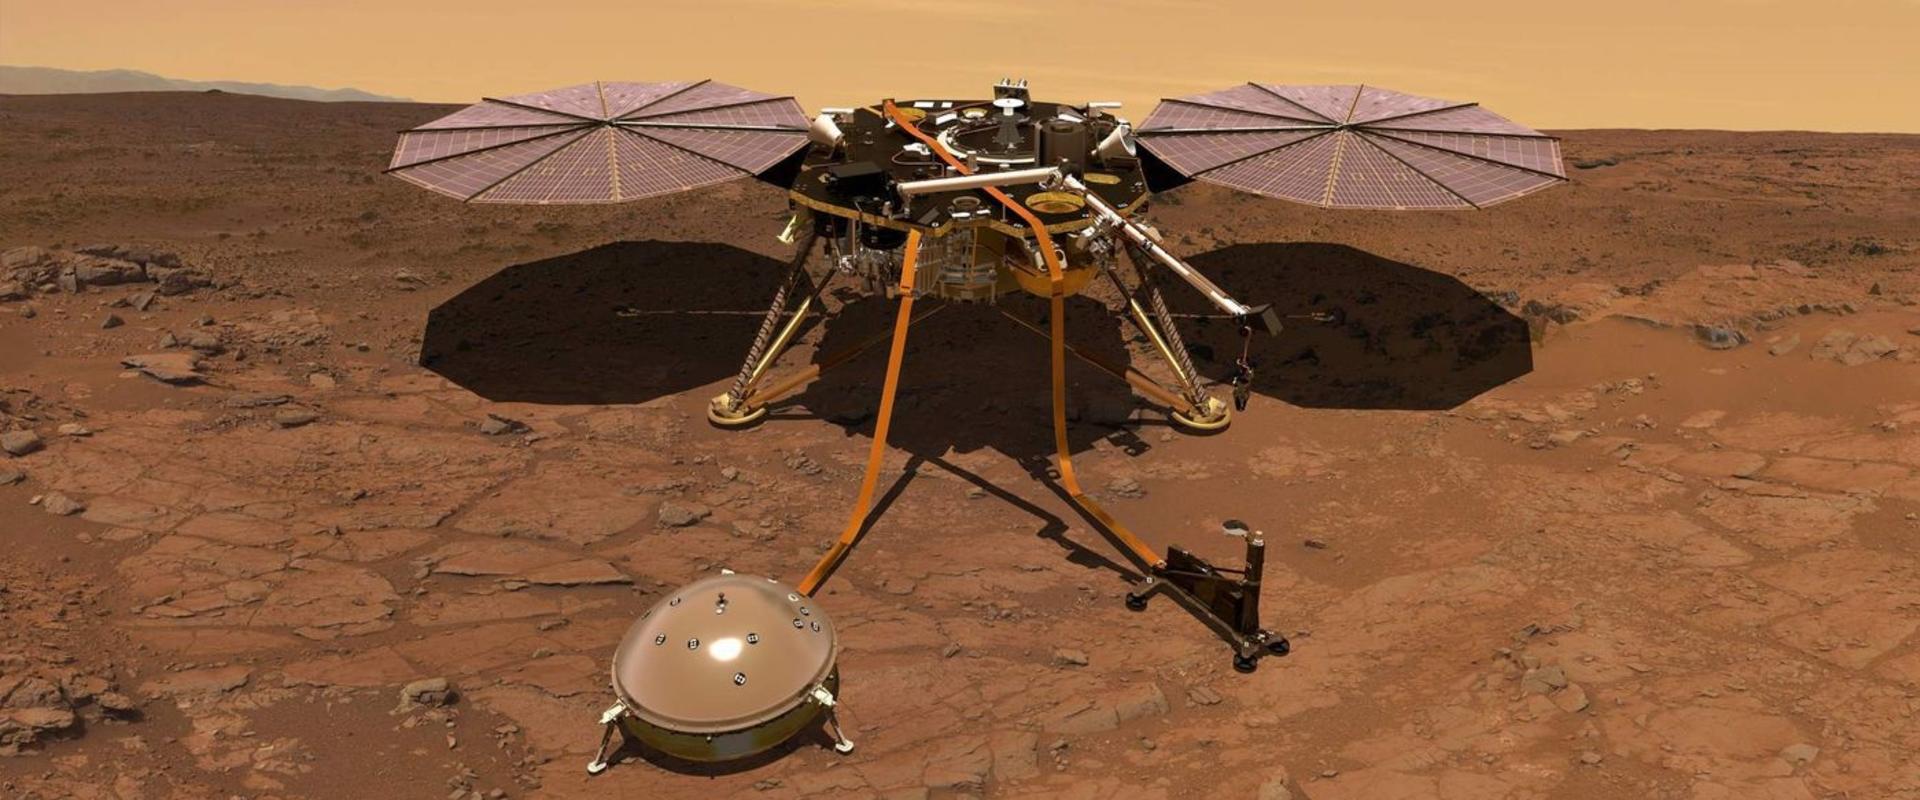 NASA успешно посадило робота InSight на Марсе-ის სურათის შედეგი